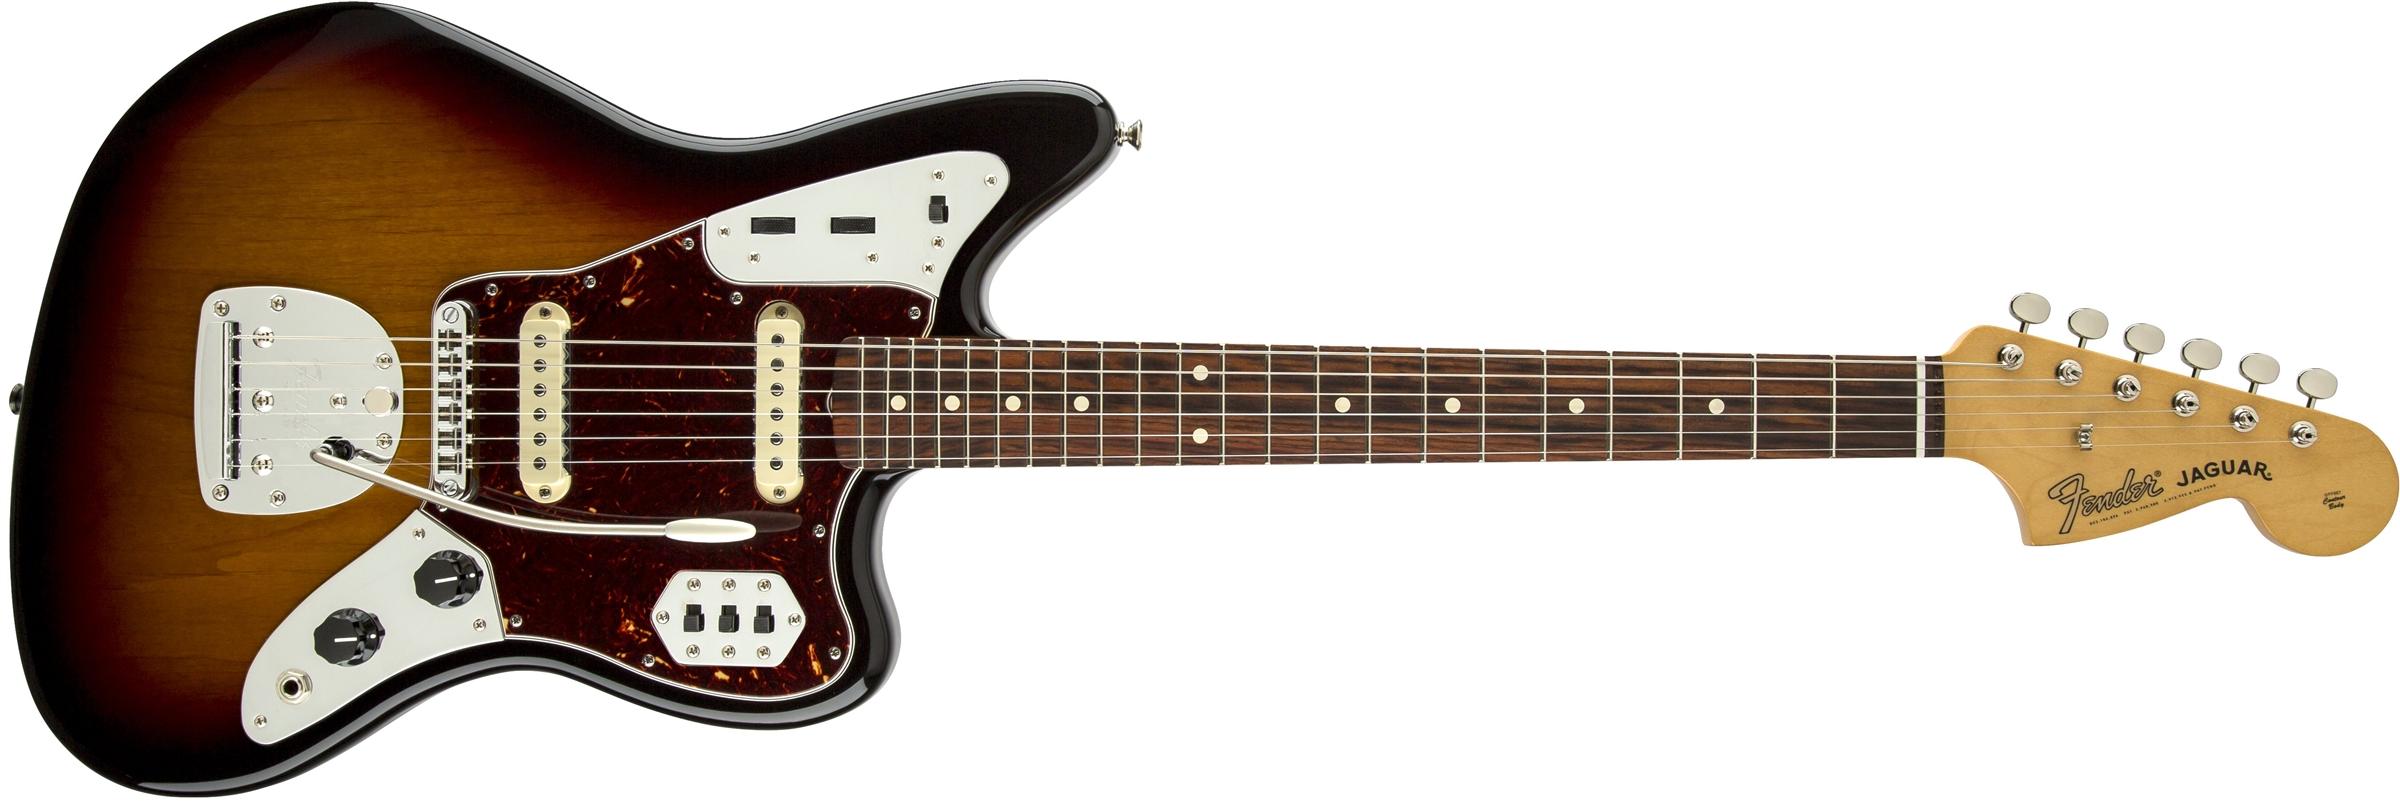 Classic Player Jaguar Special Electric Guitars